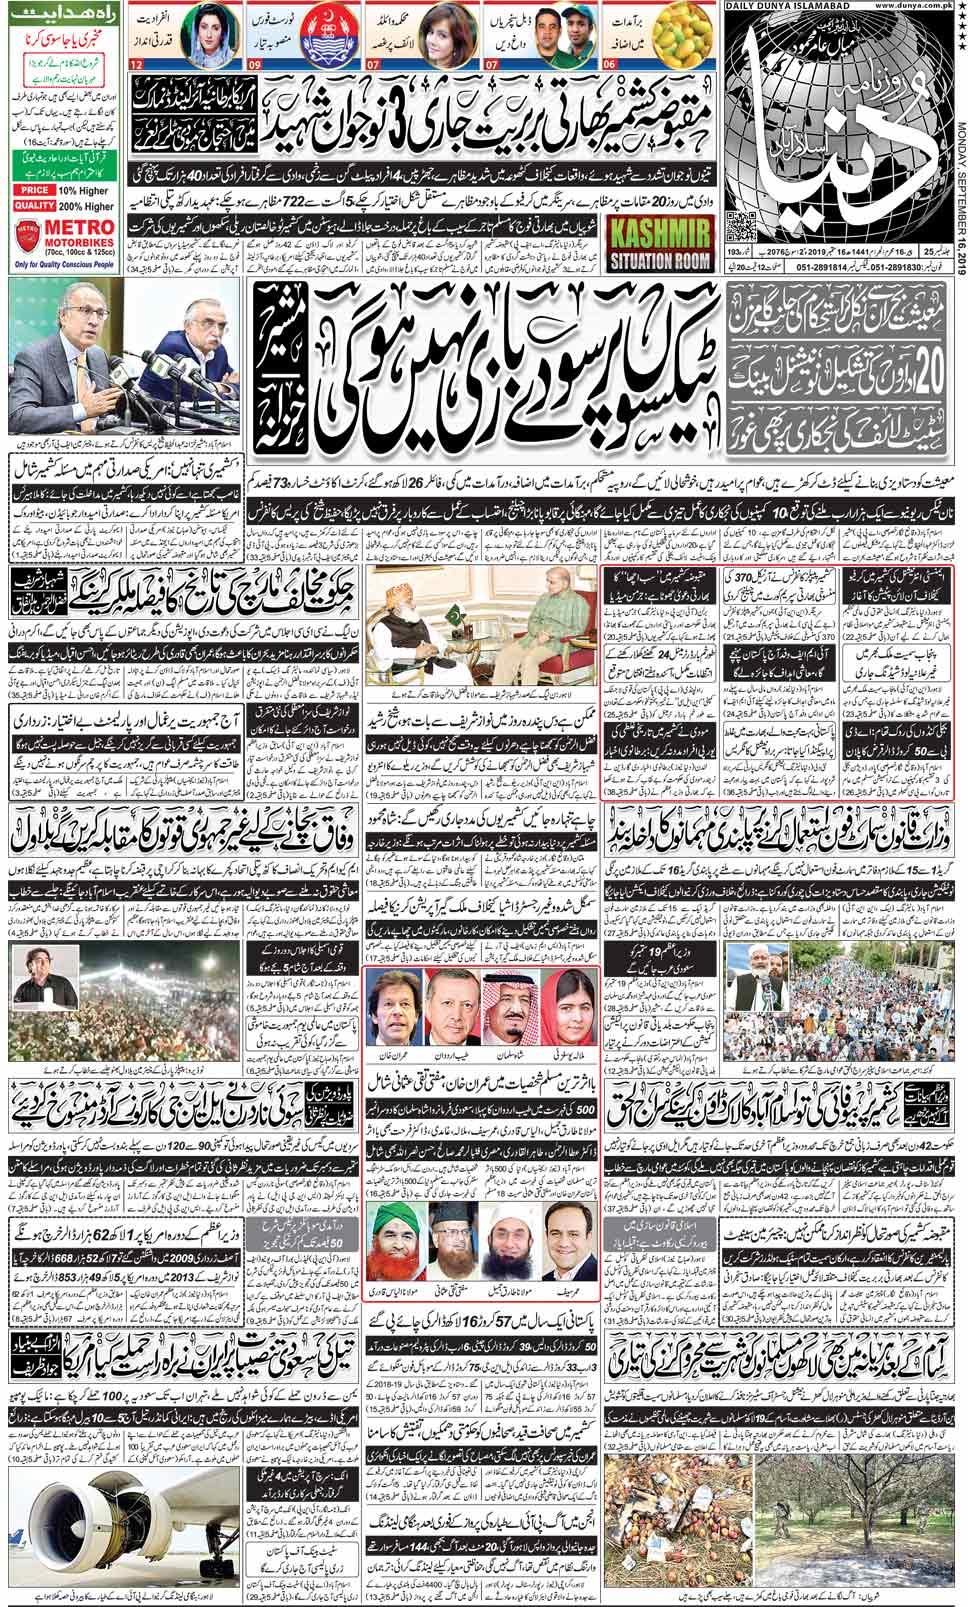 express news today horoscope in urdu